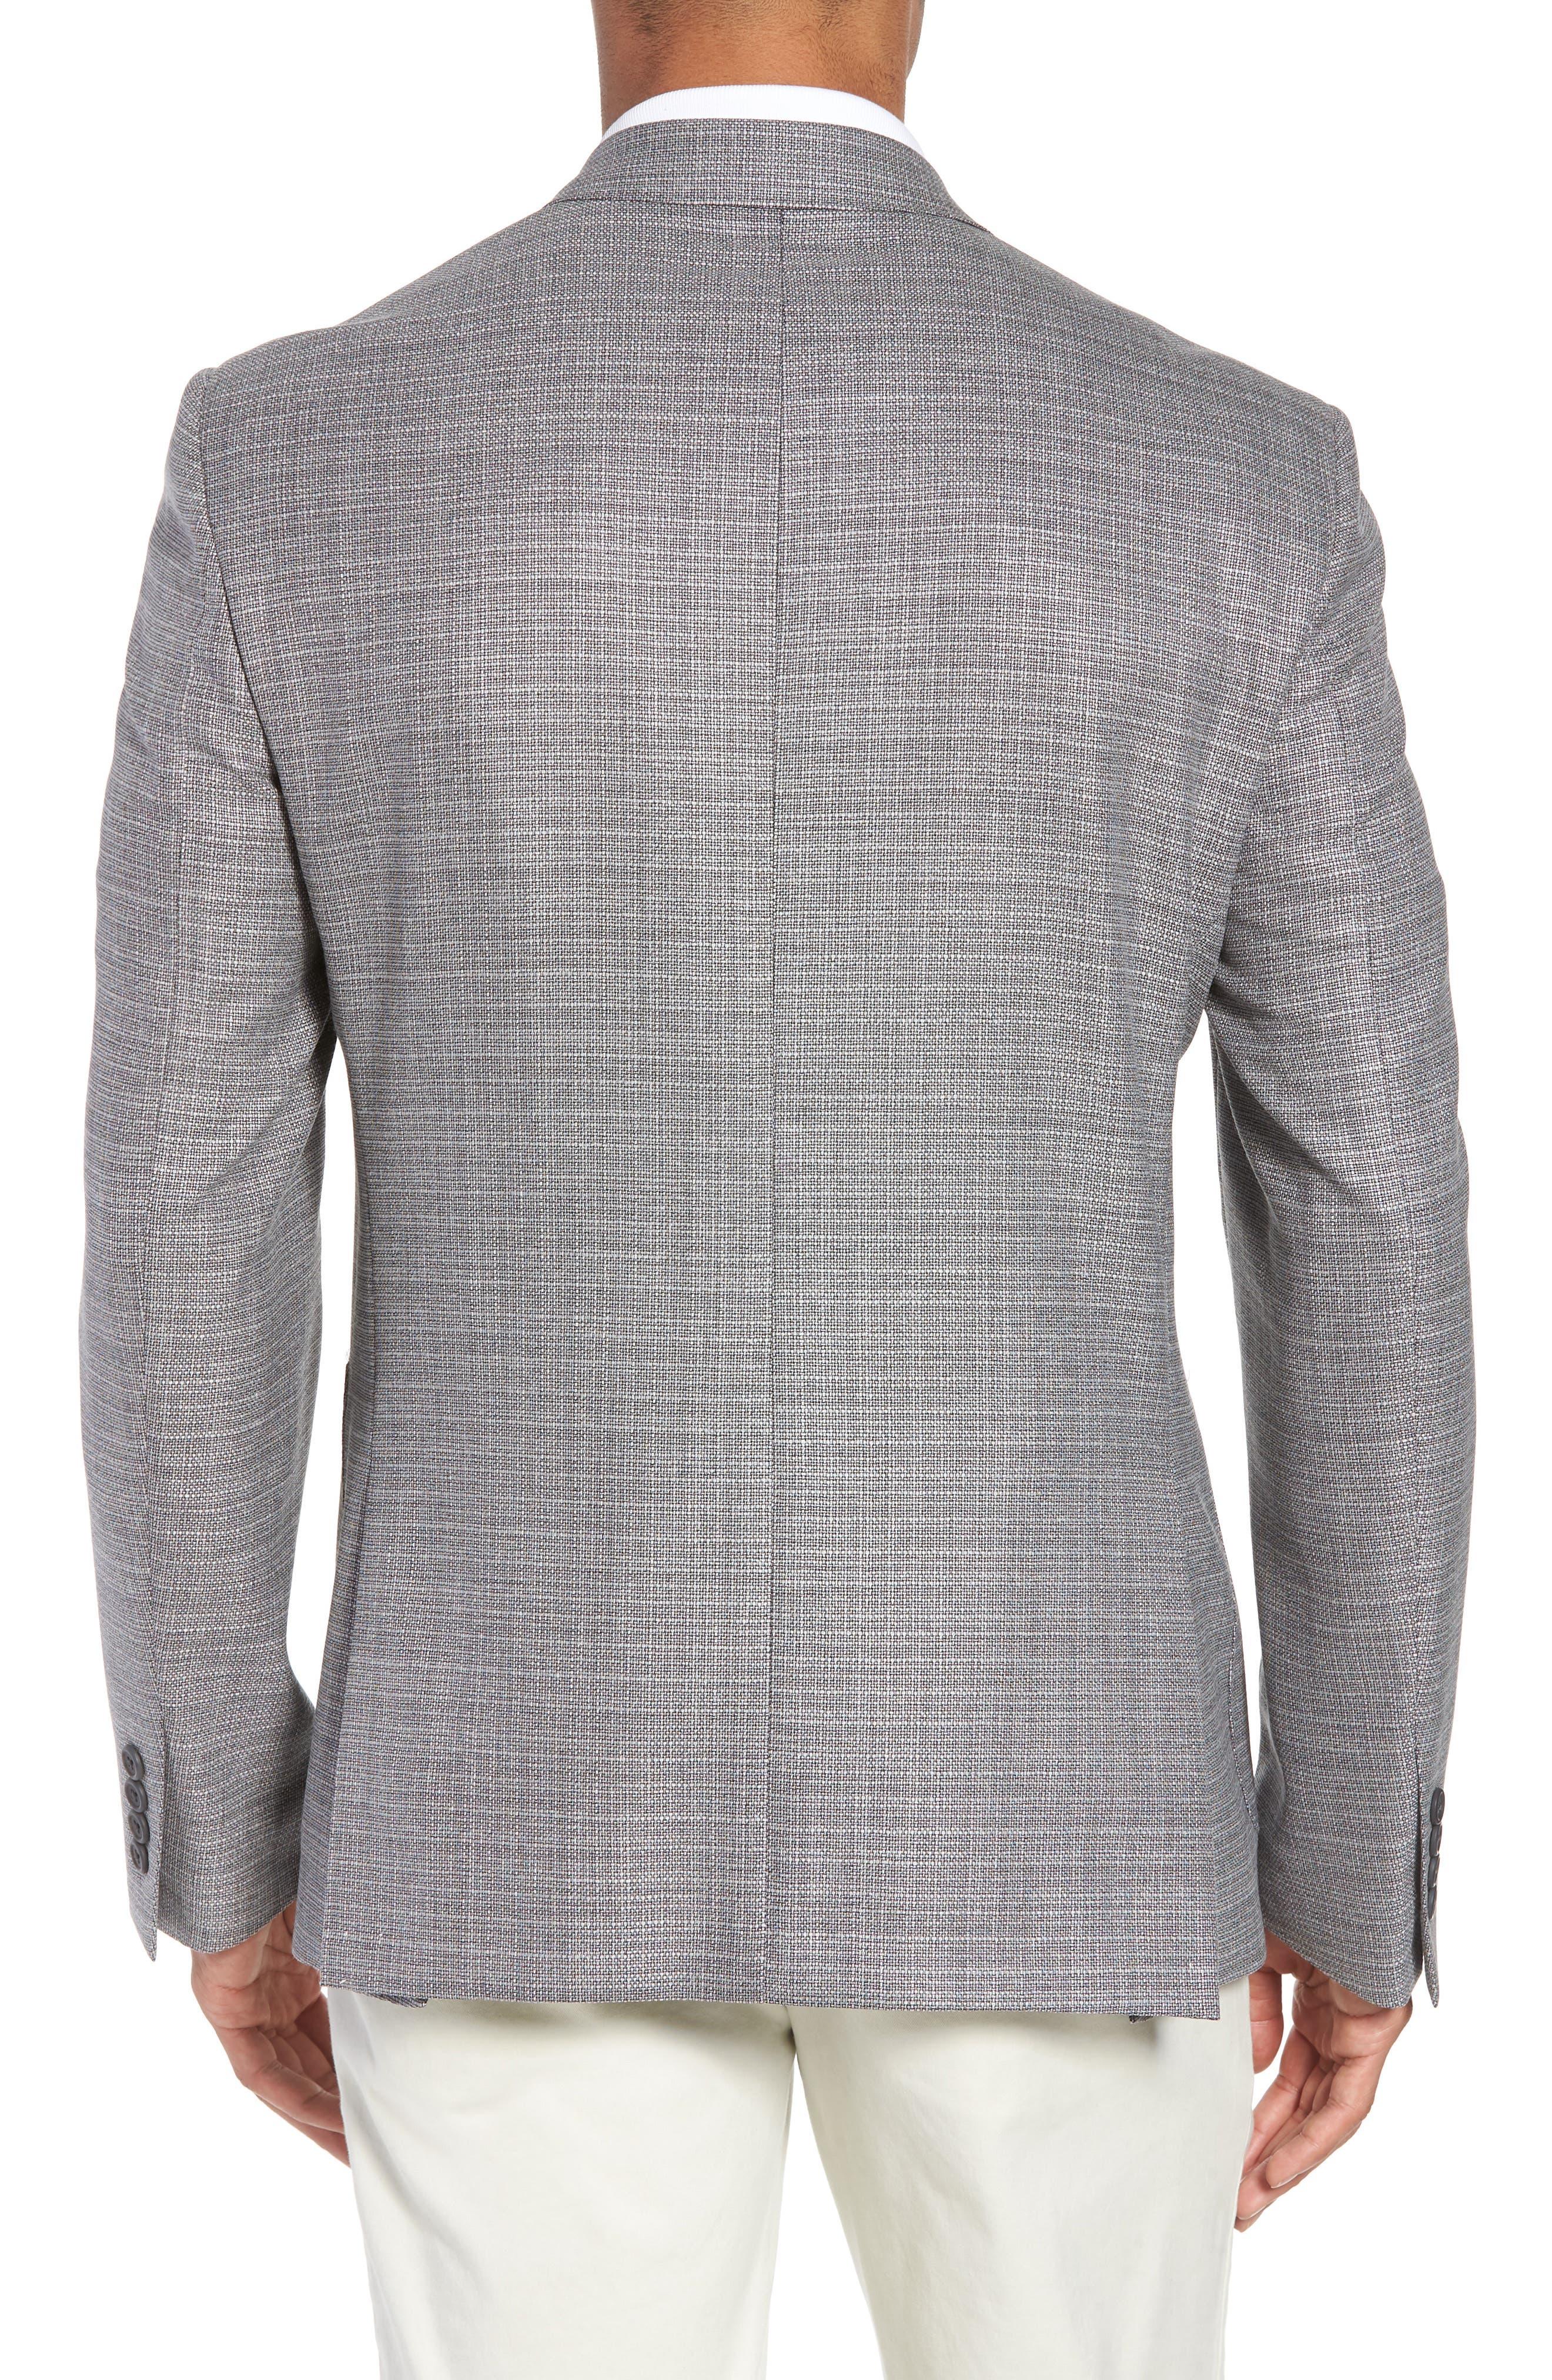 Trim Fit Wool Blazer,                             Alternate thumbnail 2, color,                             Silver